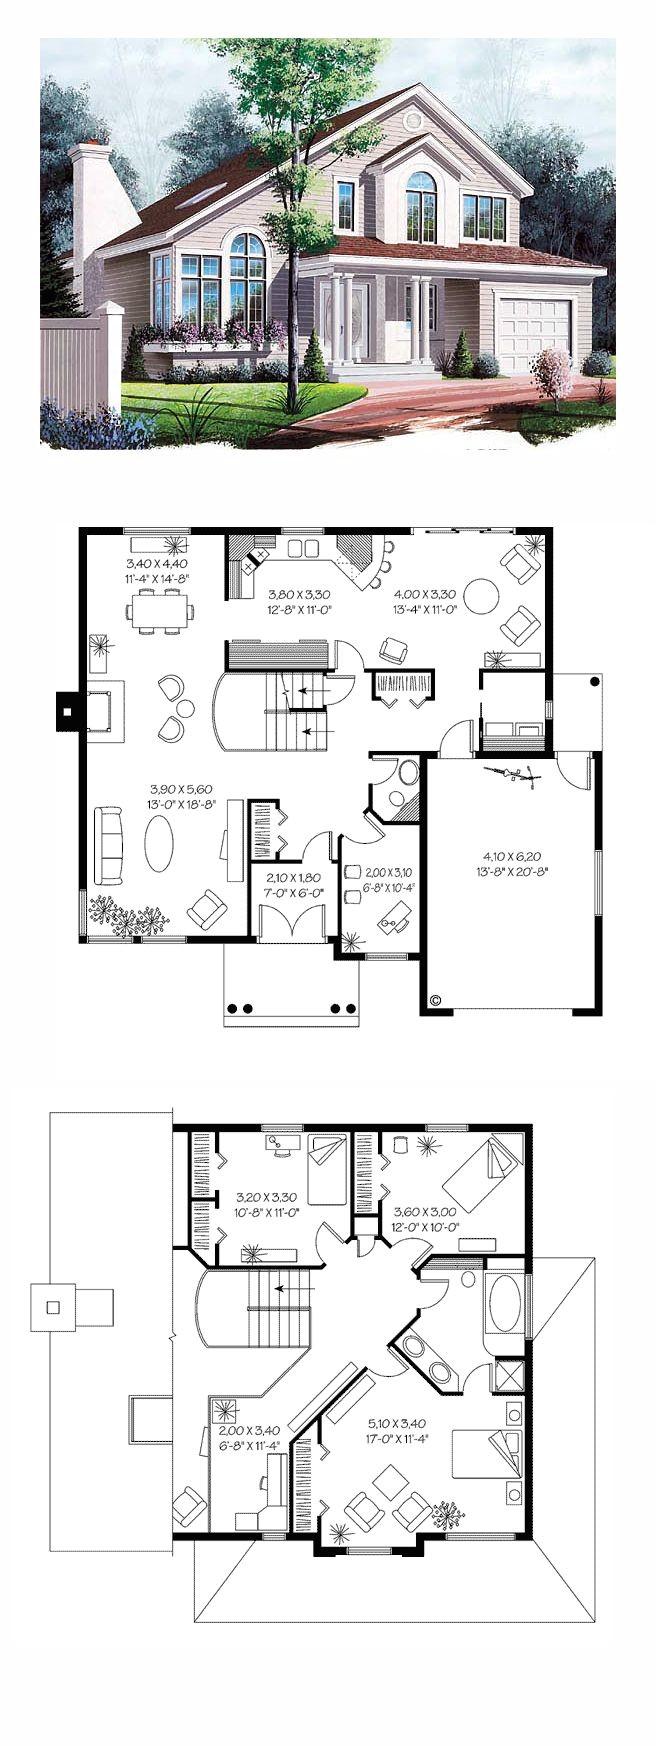 saltbox house plans